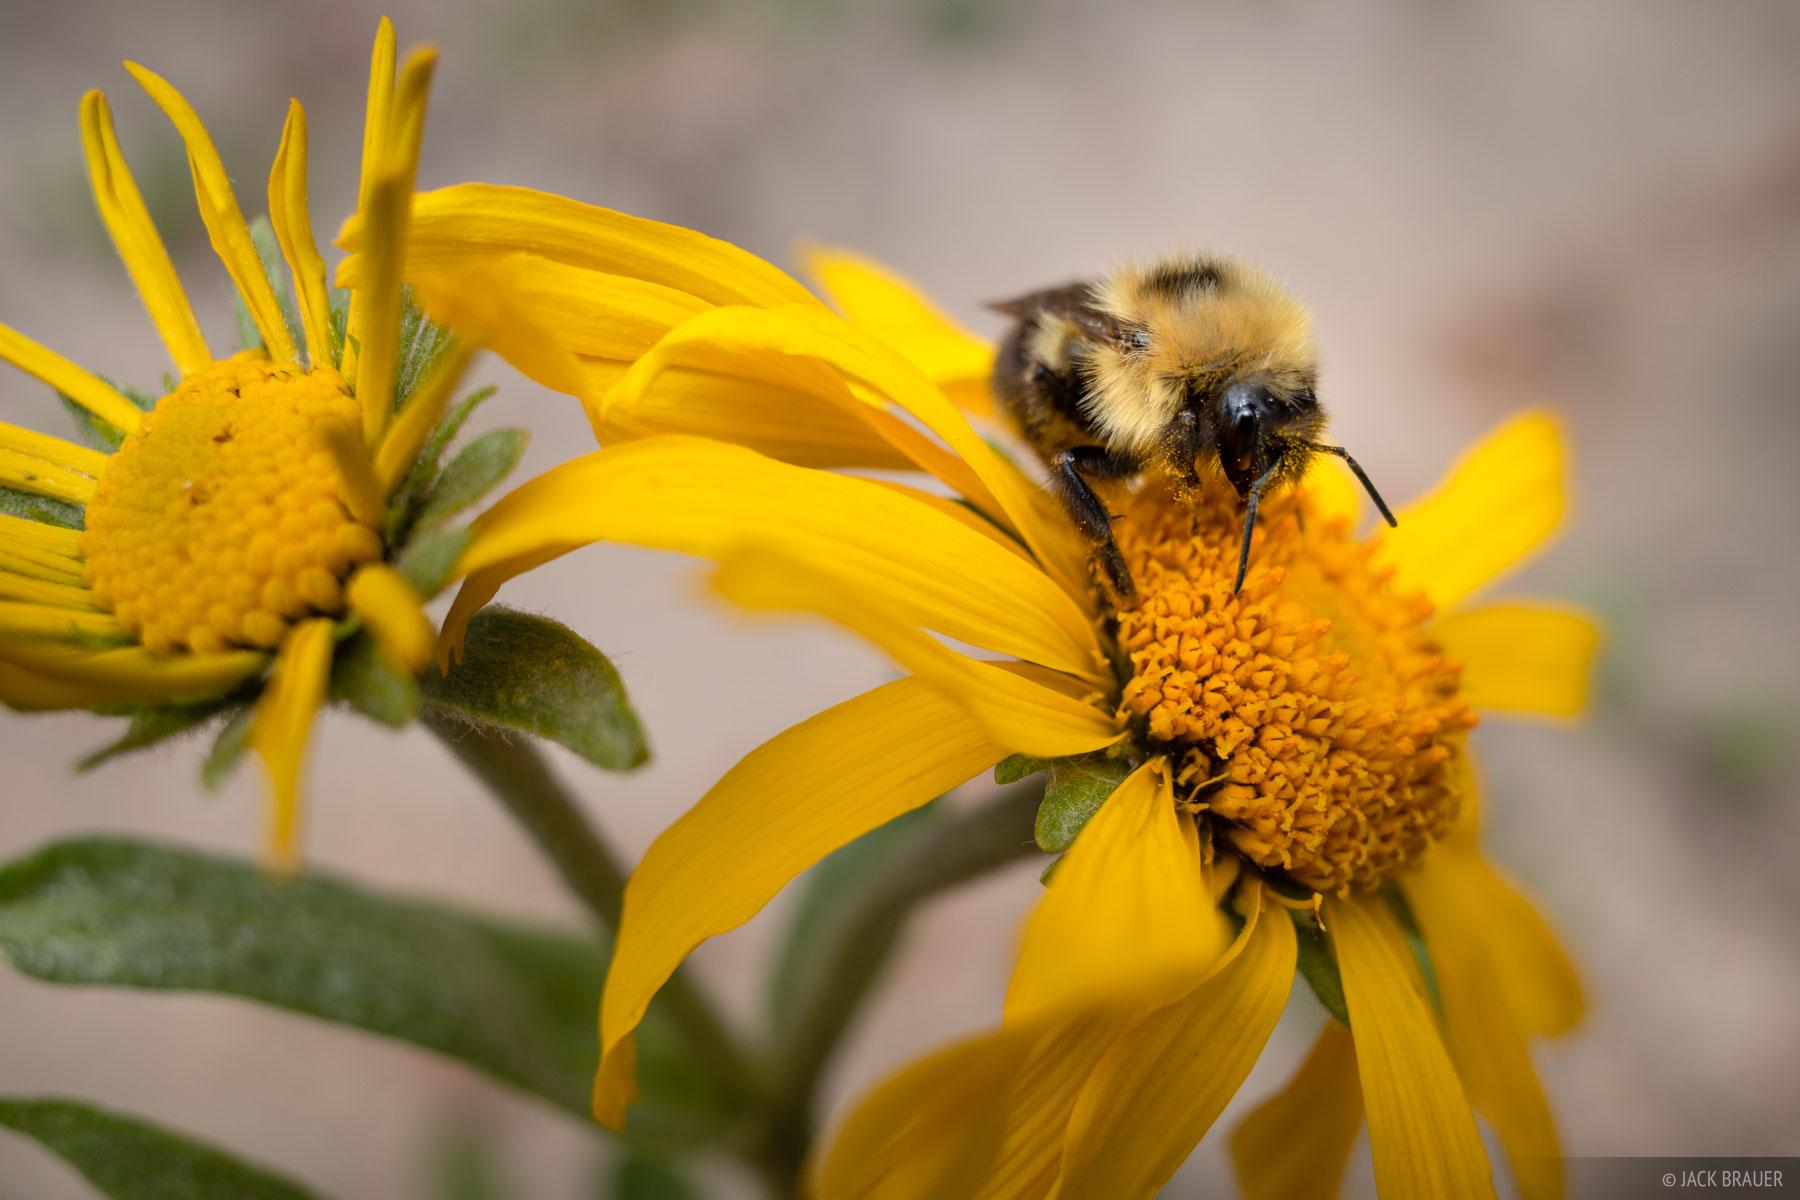 A bumblebee harvests pollen from an alpine wildflower.